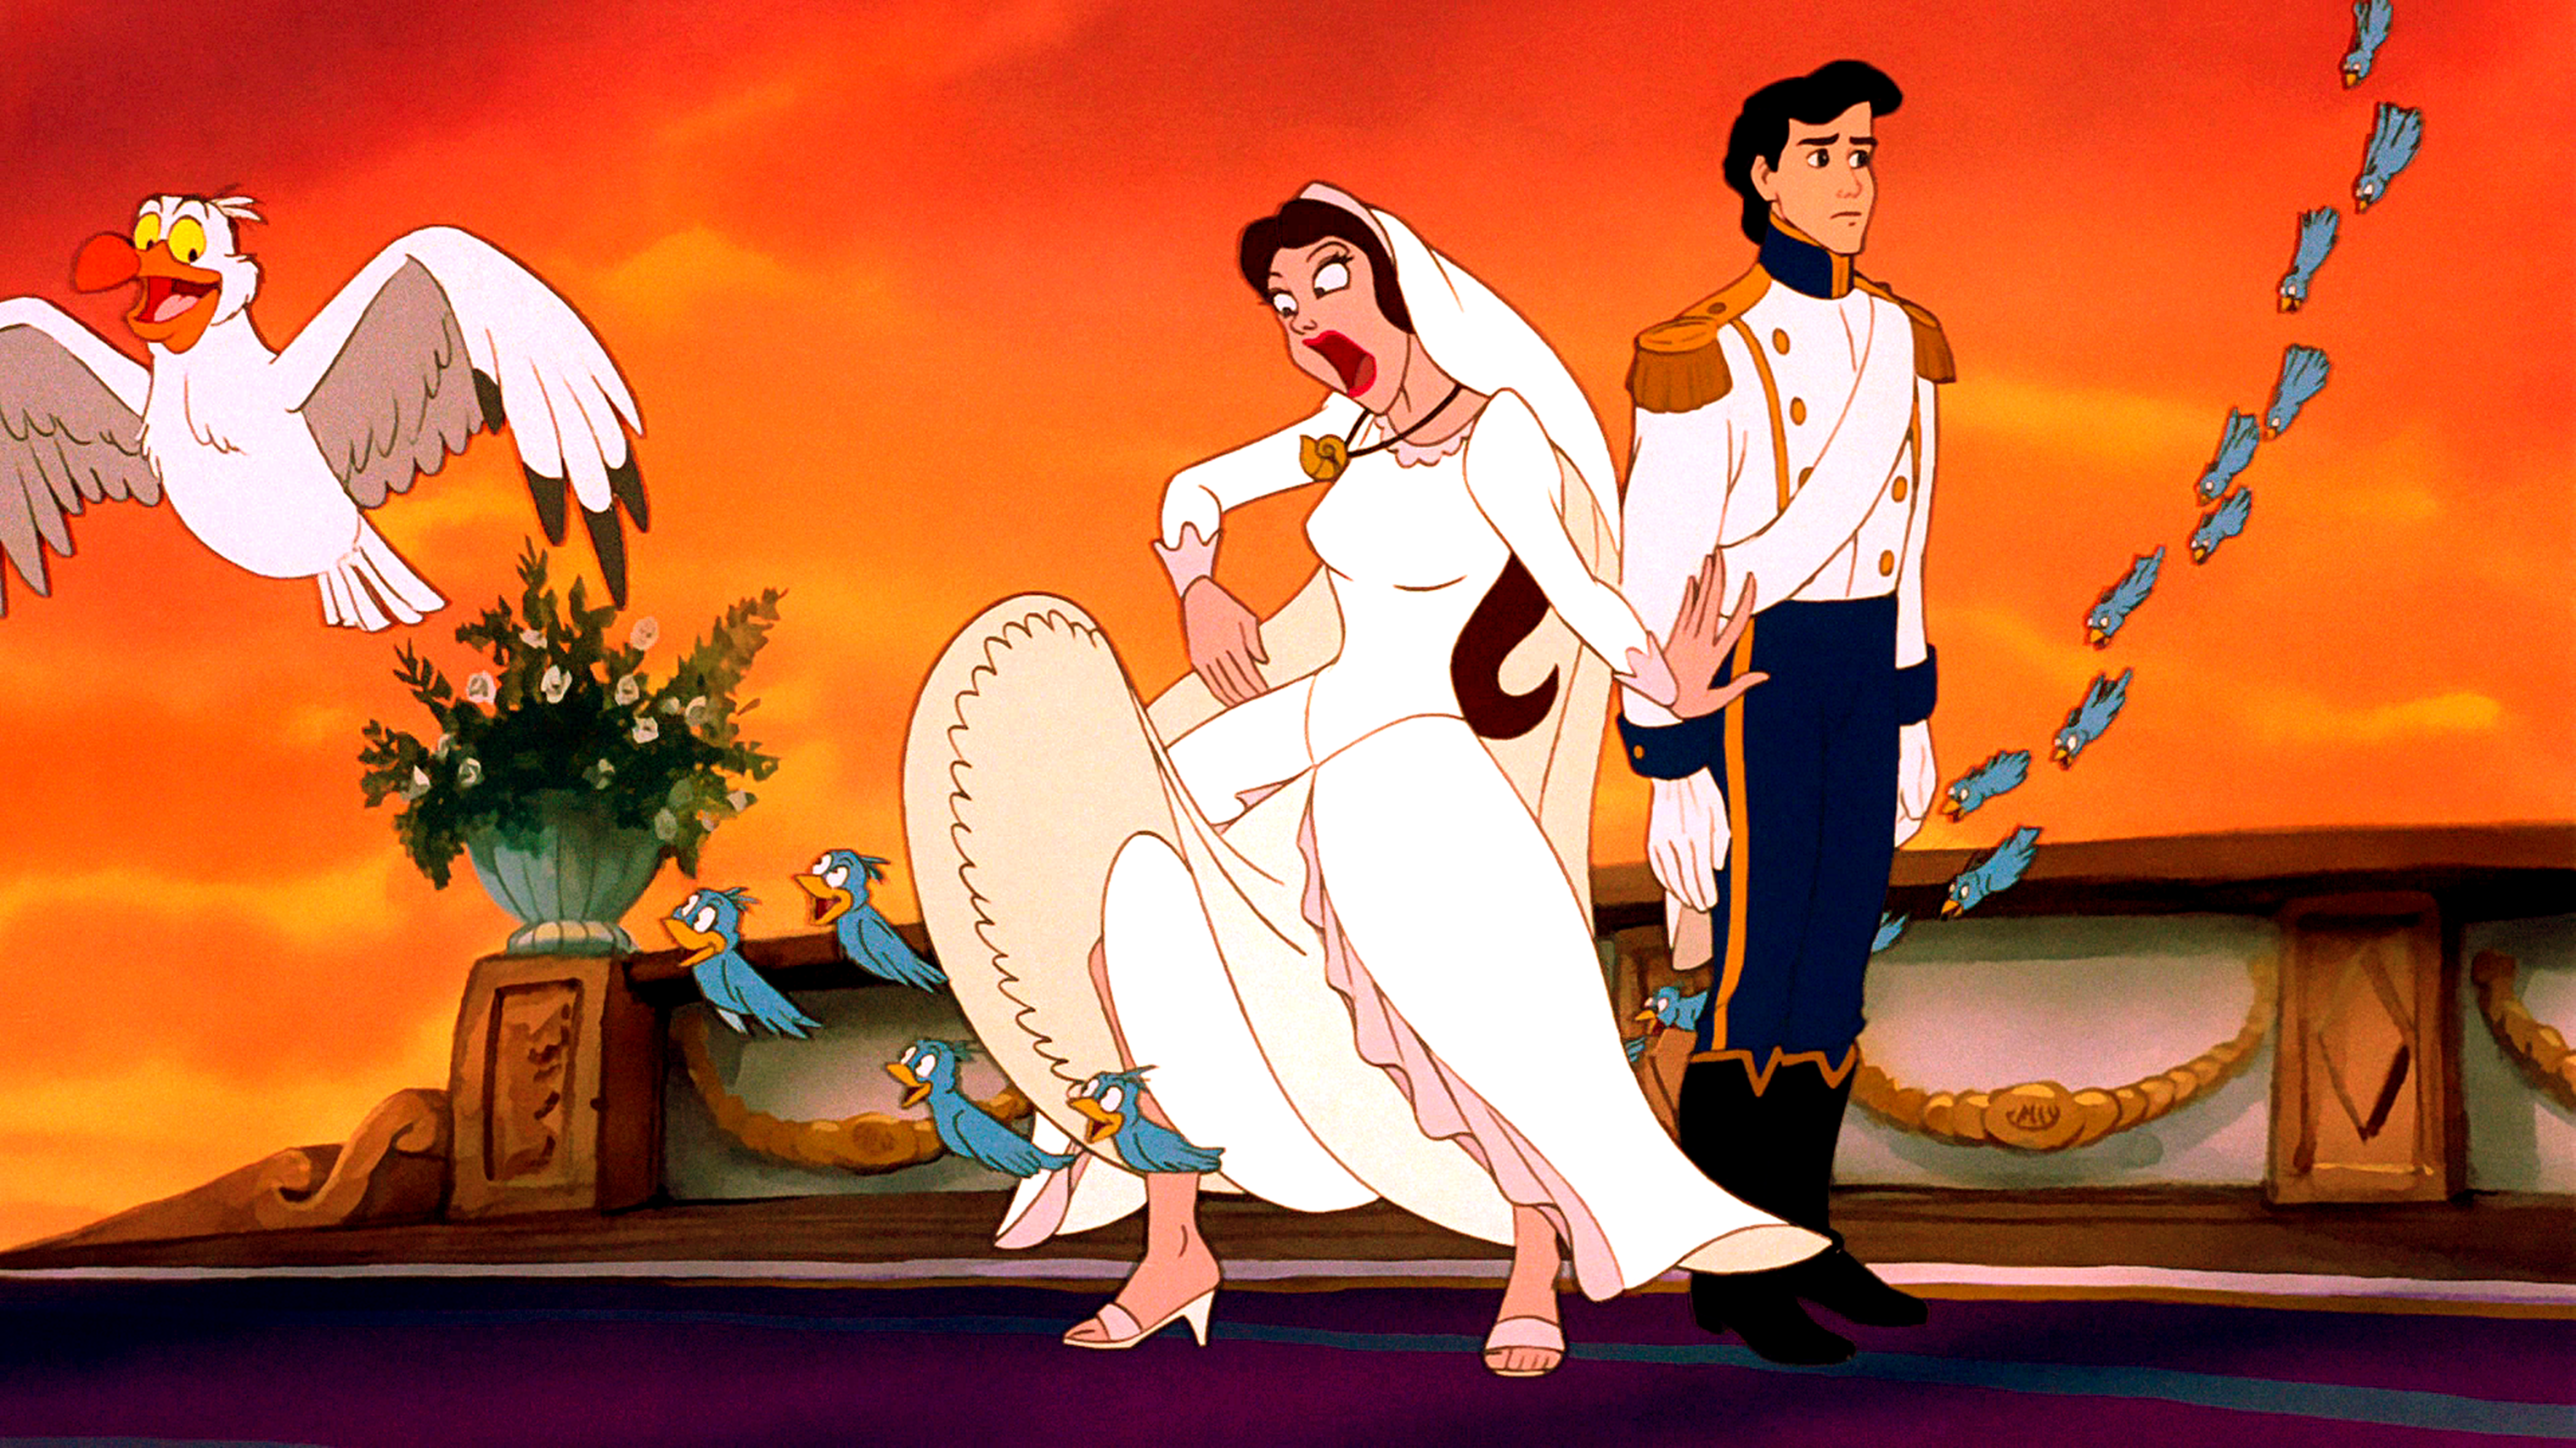 Walt Disney Screencaps – Scuttle, The Blue Birds, Vanessa & Prince Eric